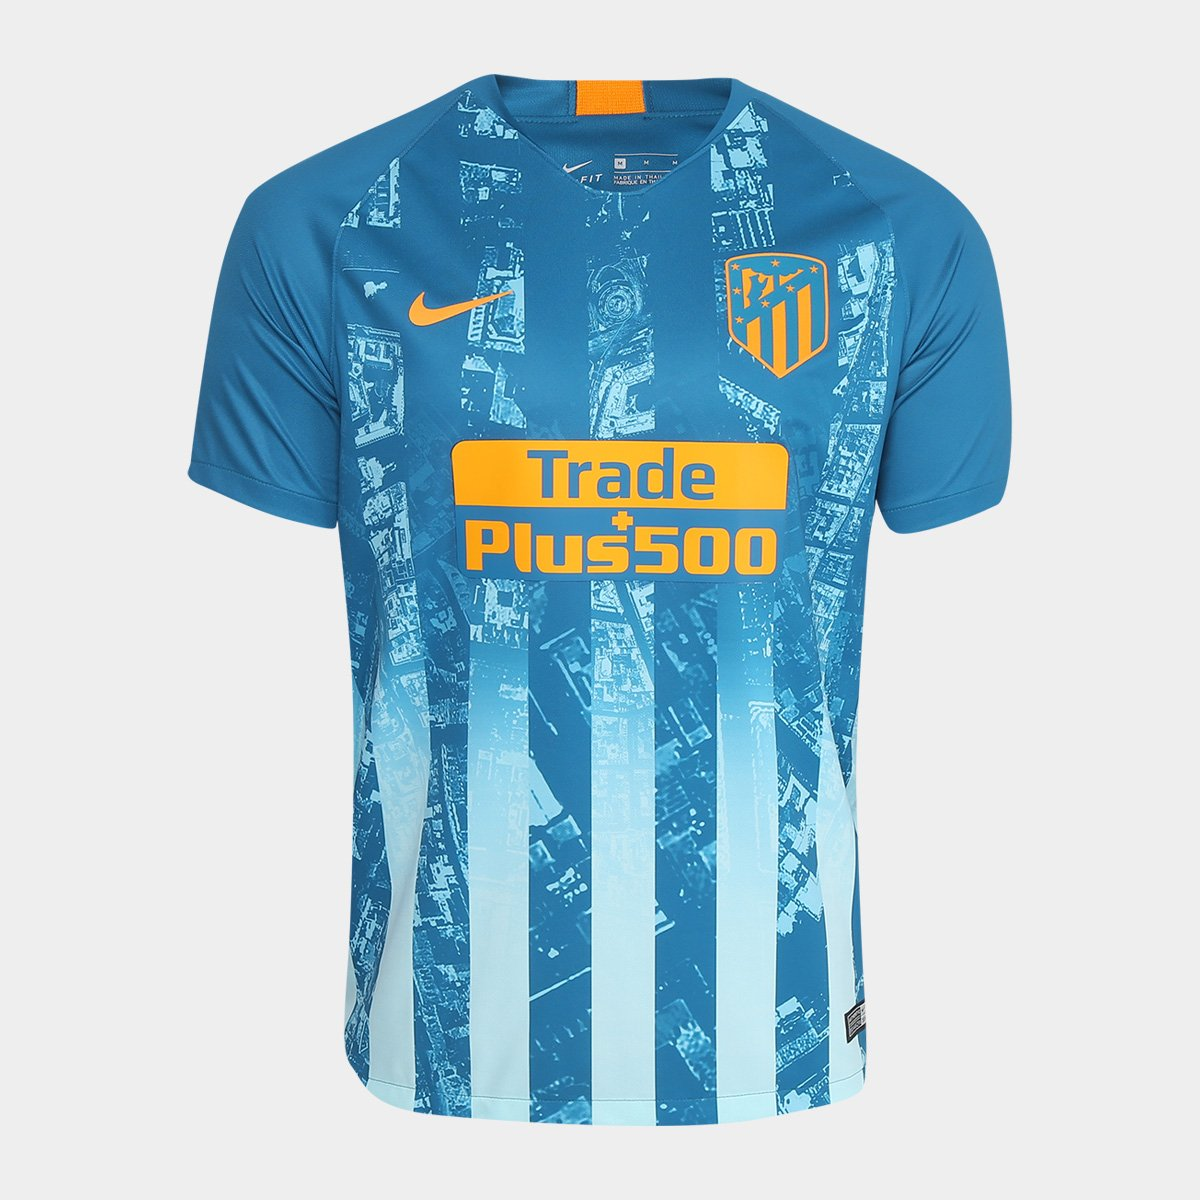 Camisa Atlético Madrid Third 2018 s n° - Torcedor Nike Masculina - Azul  Petróleo - Compre Agora  28833dfbe0b8d